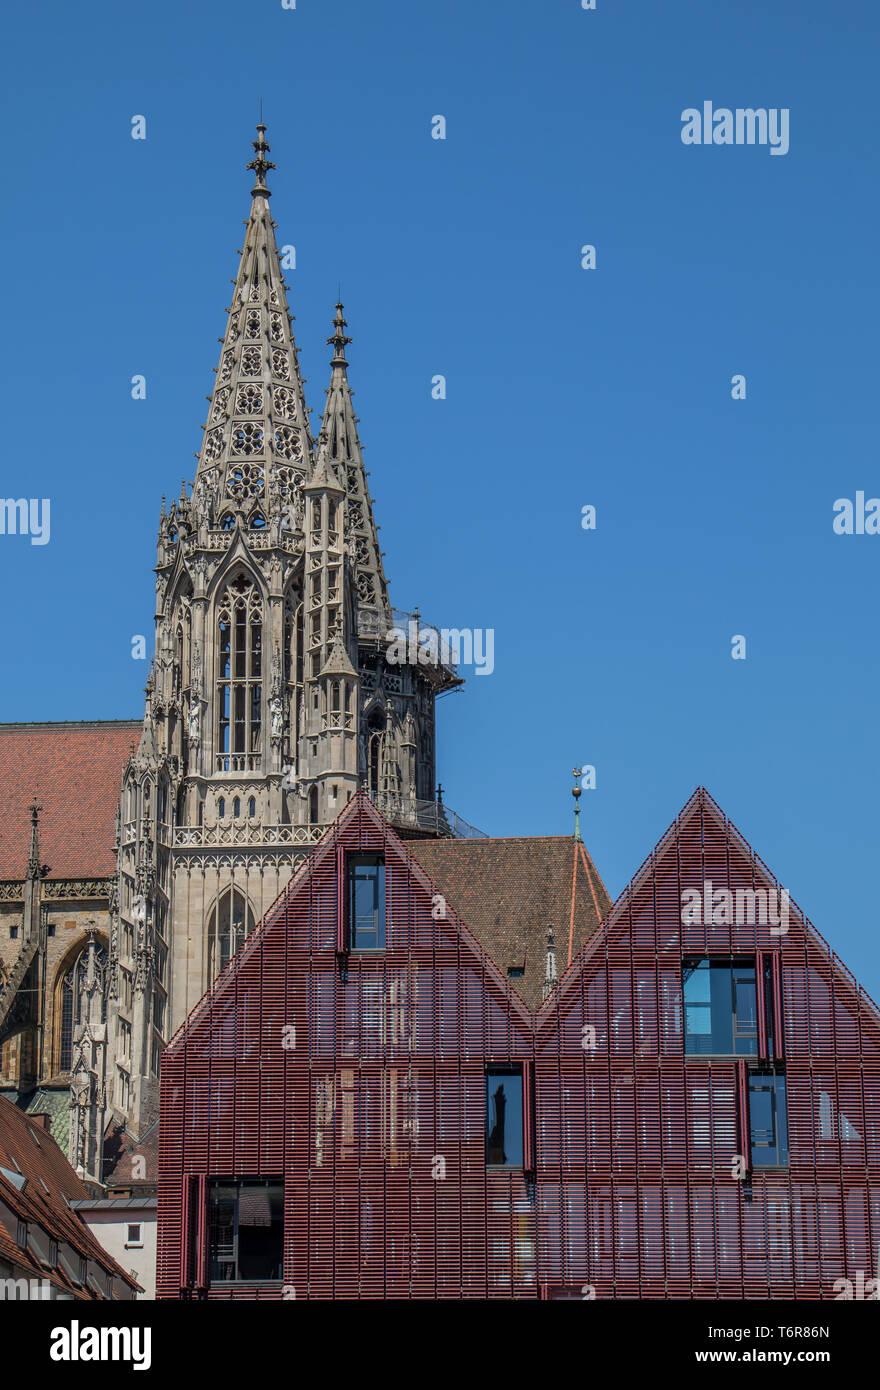 Ulm Minster Stock Photo